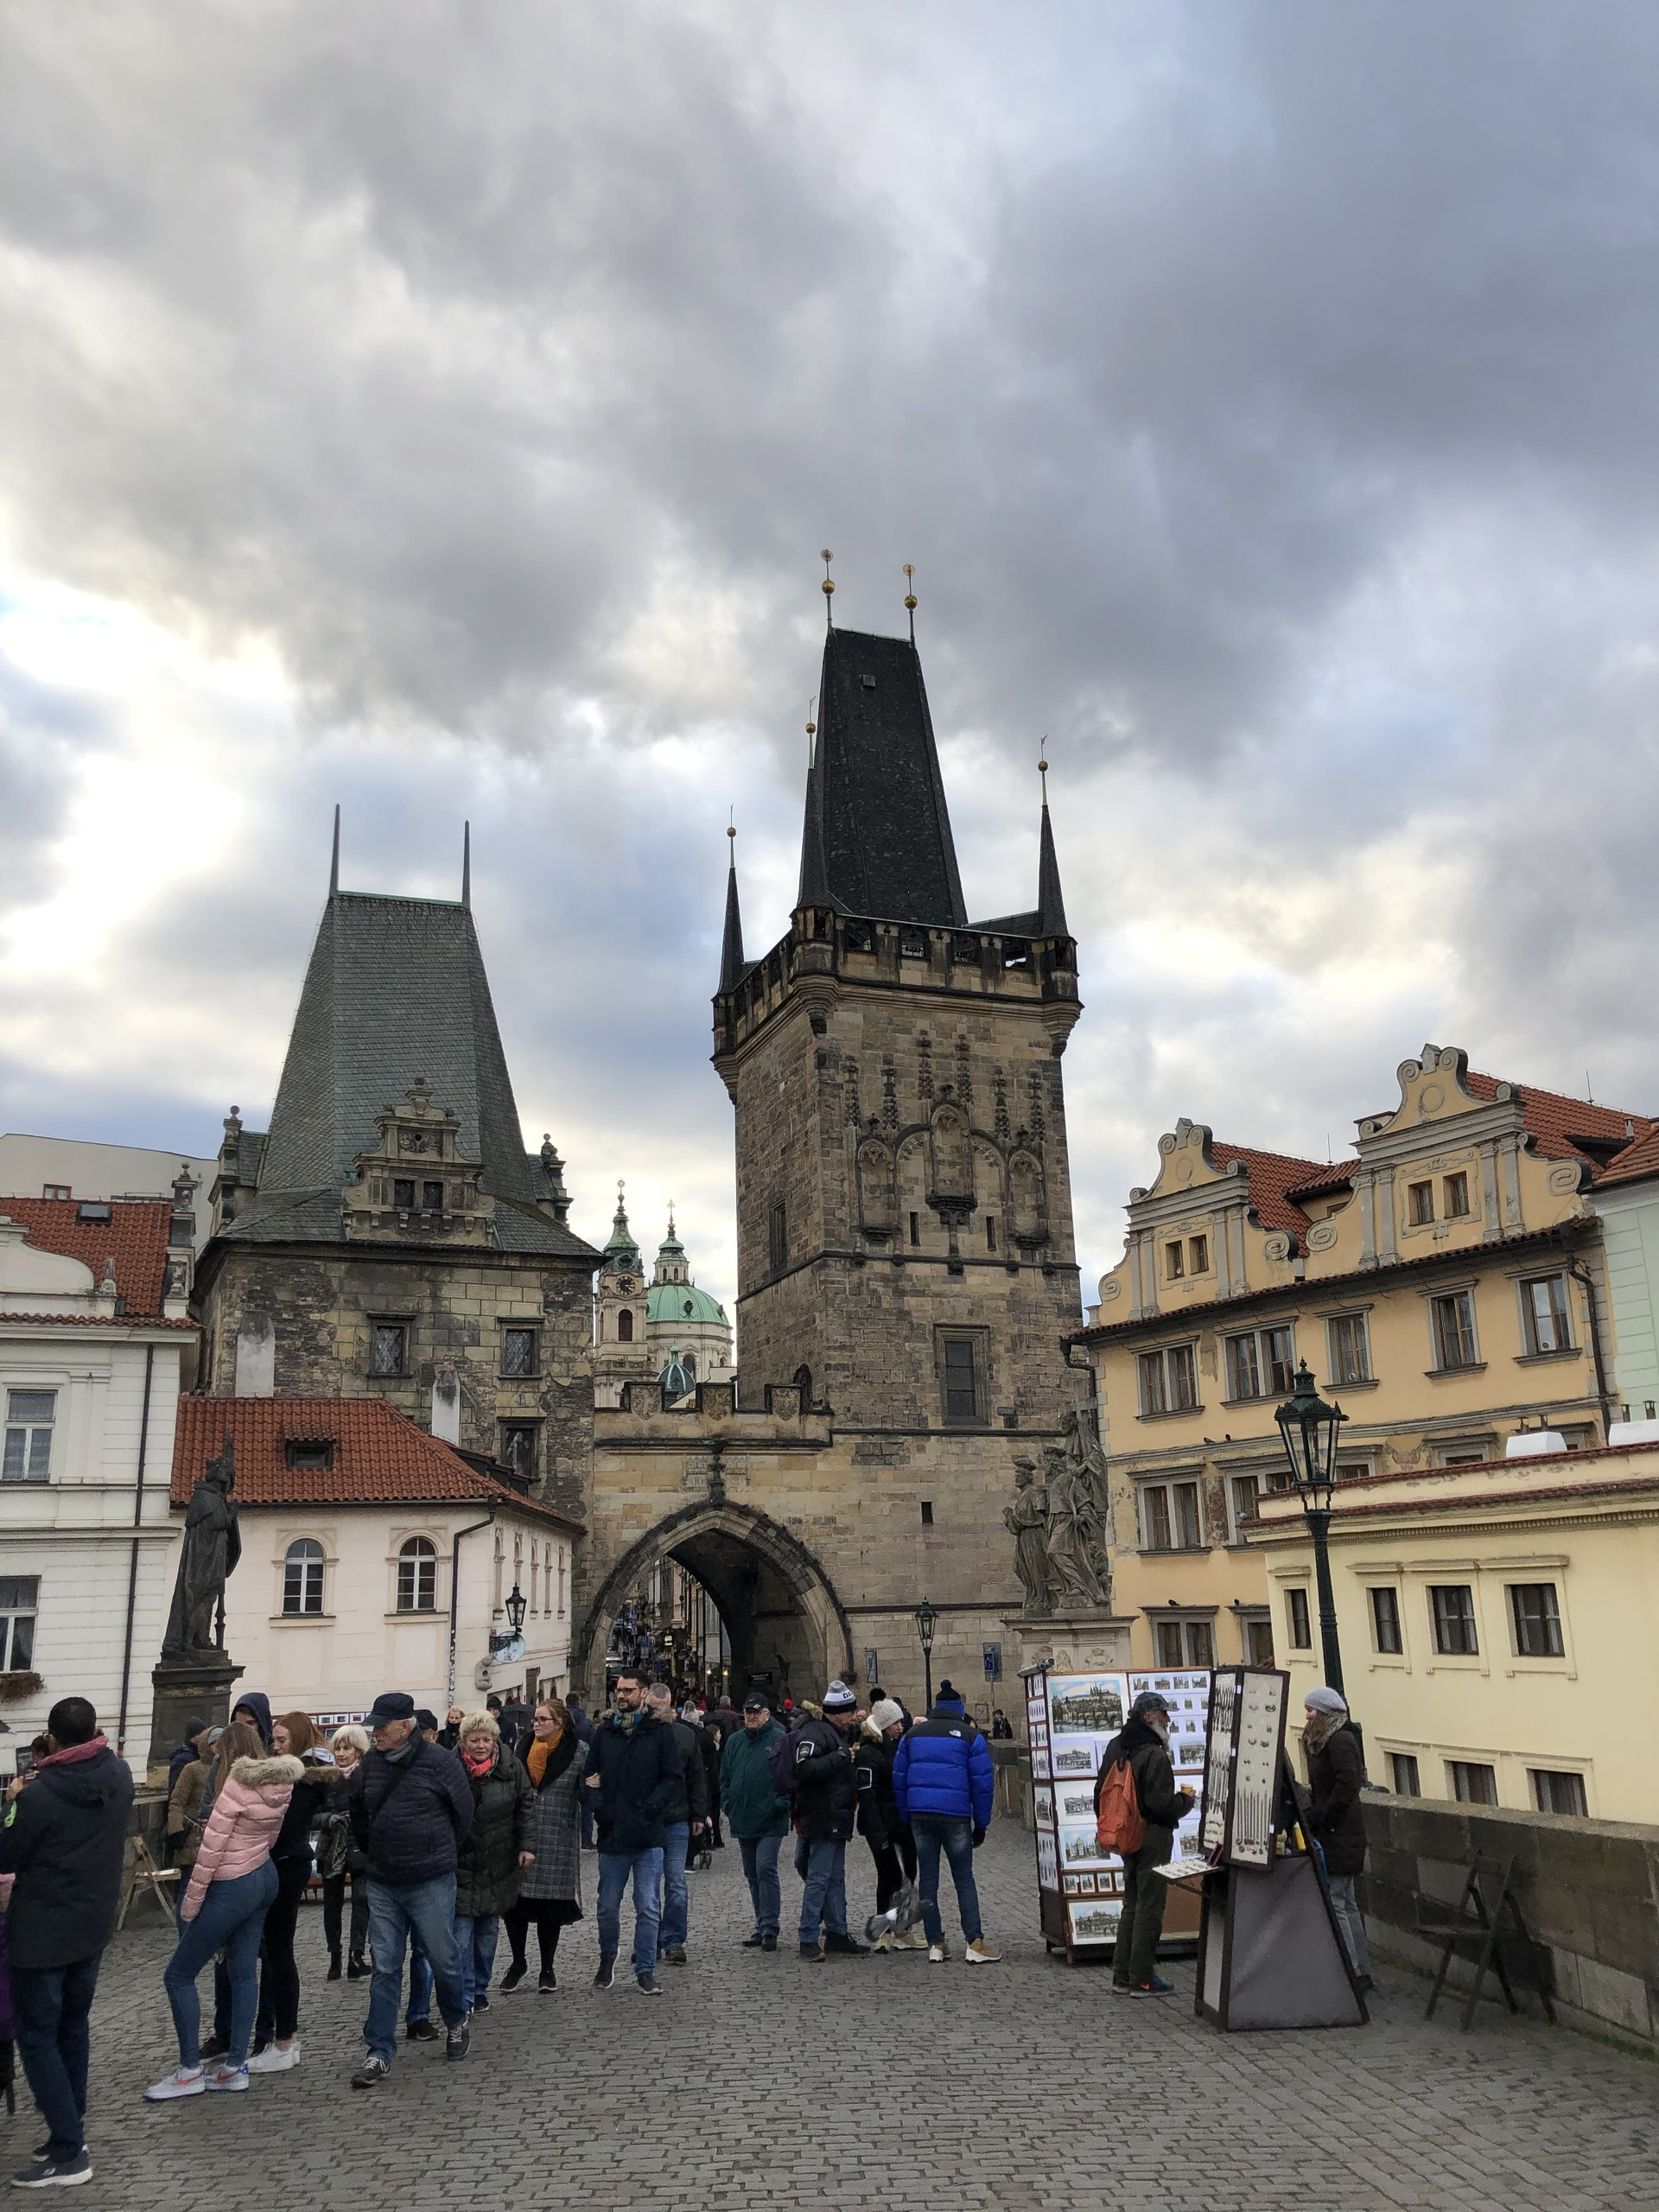 Primera parte de Praga